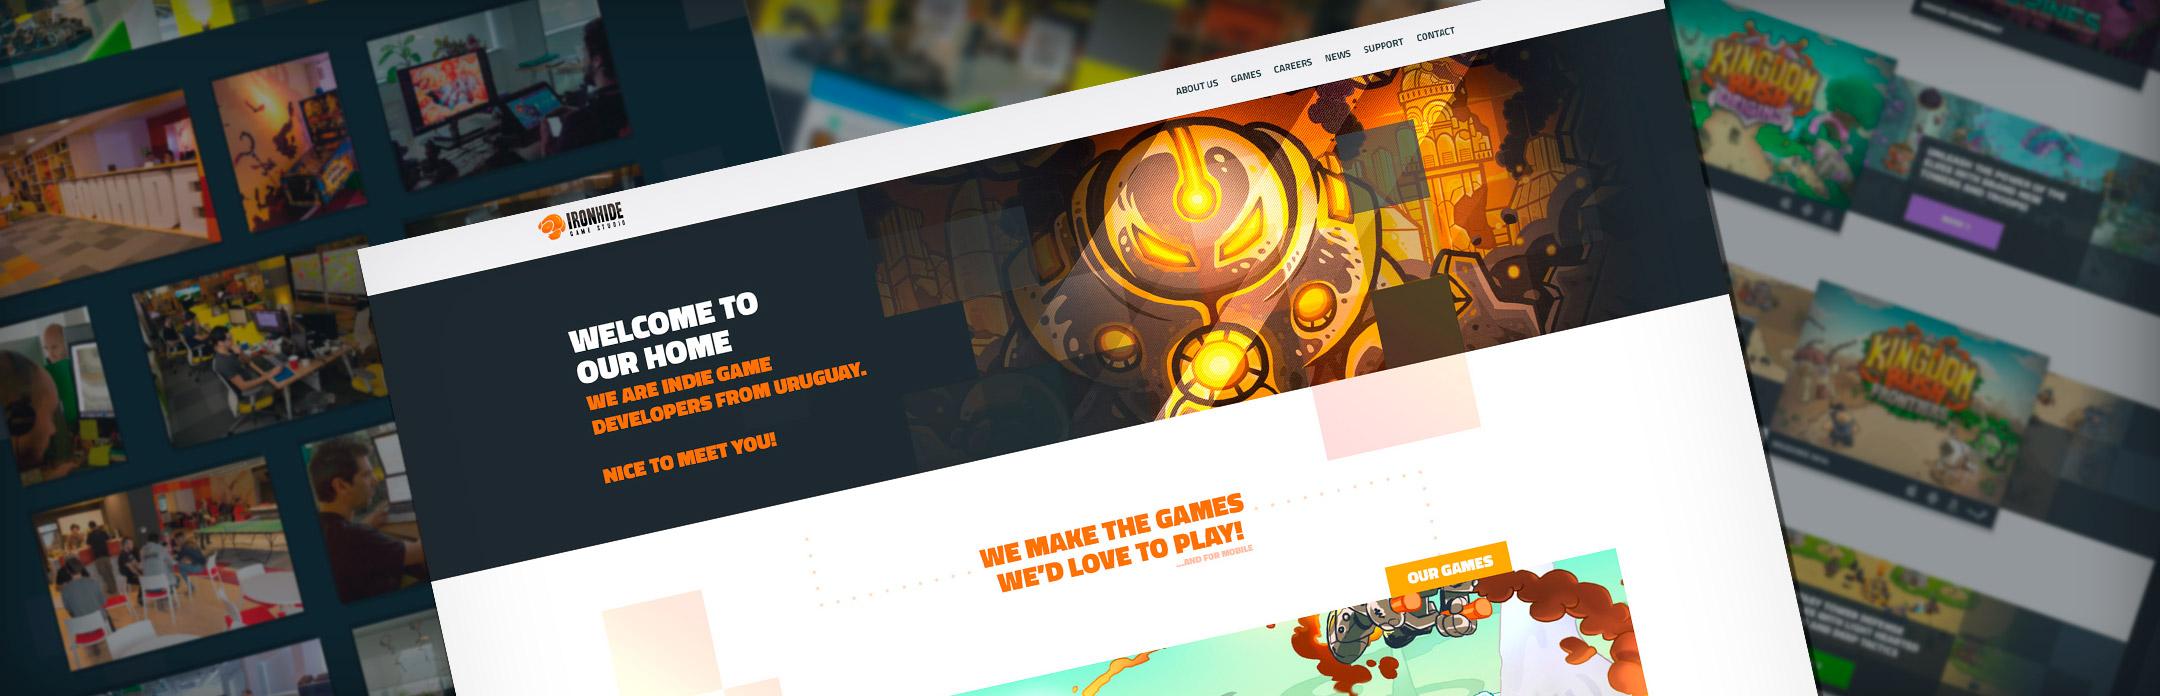 New Iron-Website 2016! - Ironhide Game Studio